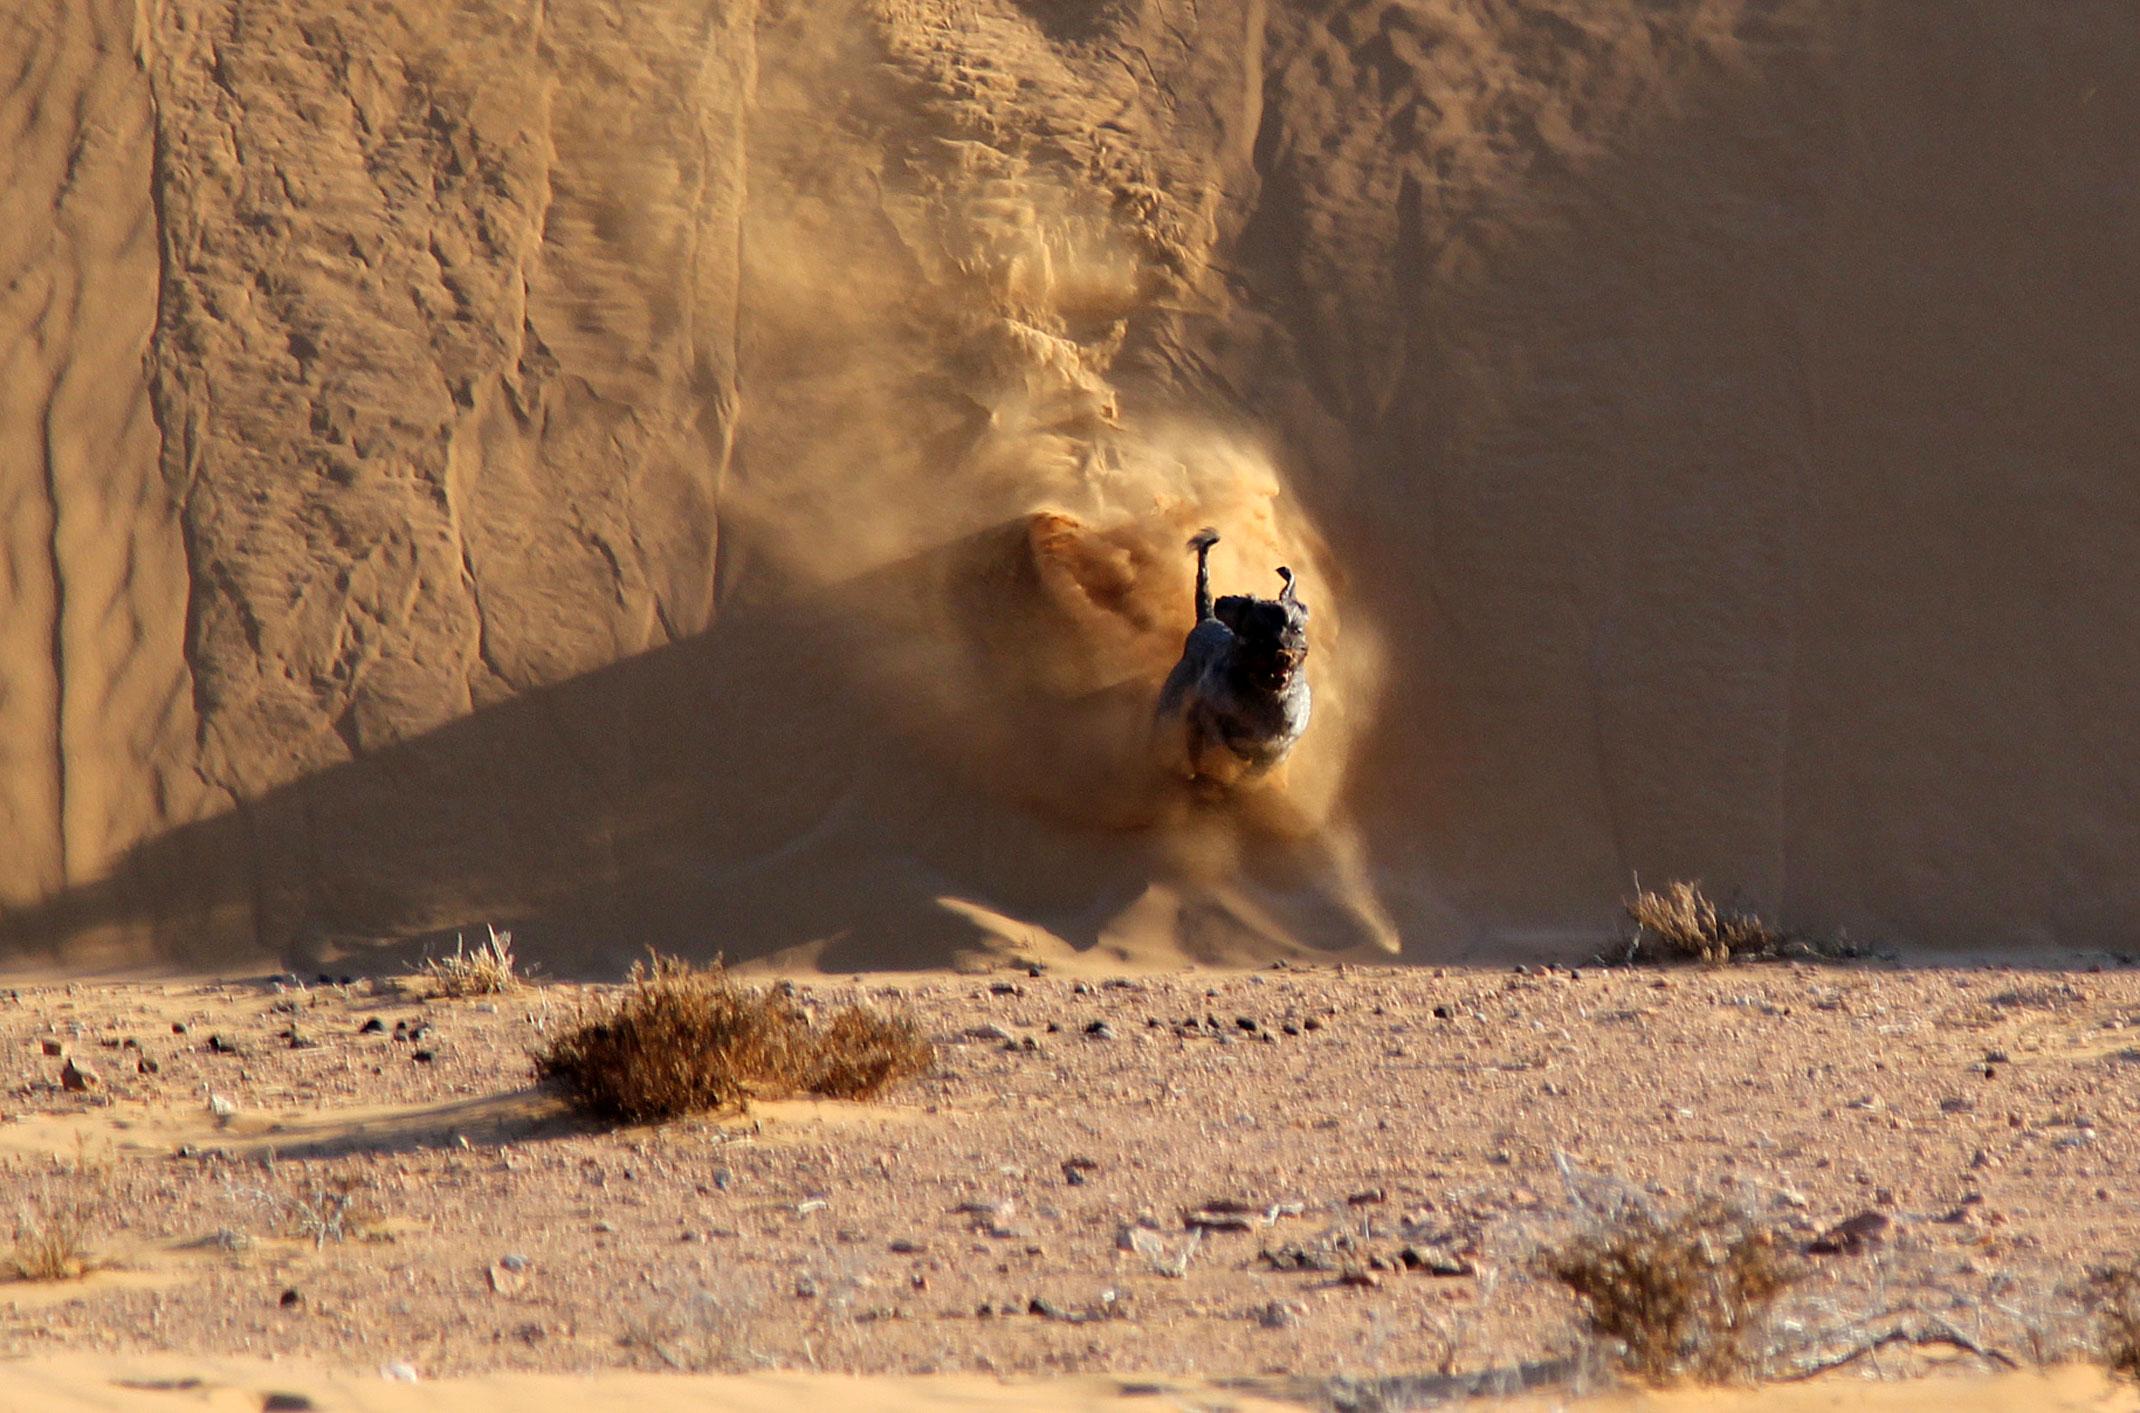 Pies na pustyni.Sahara Zachodnia.Jasiek pies pustyni